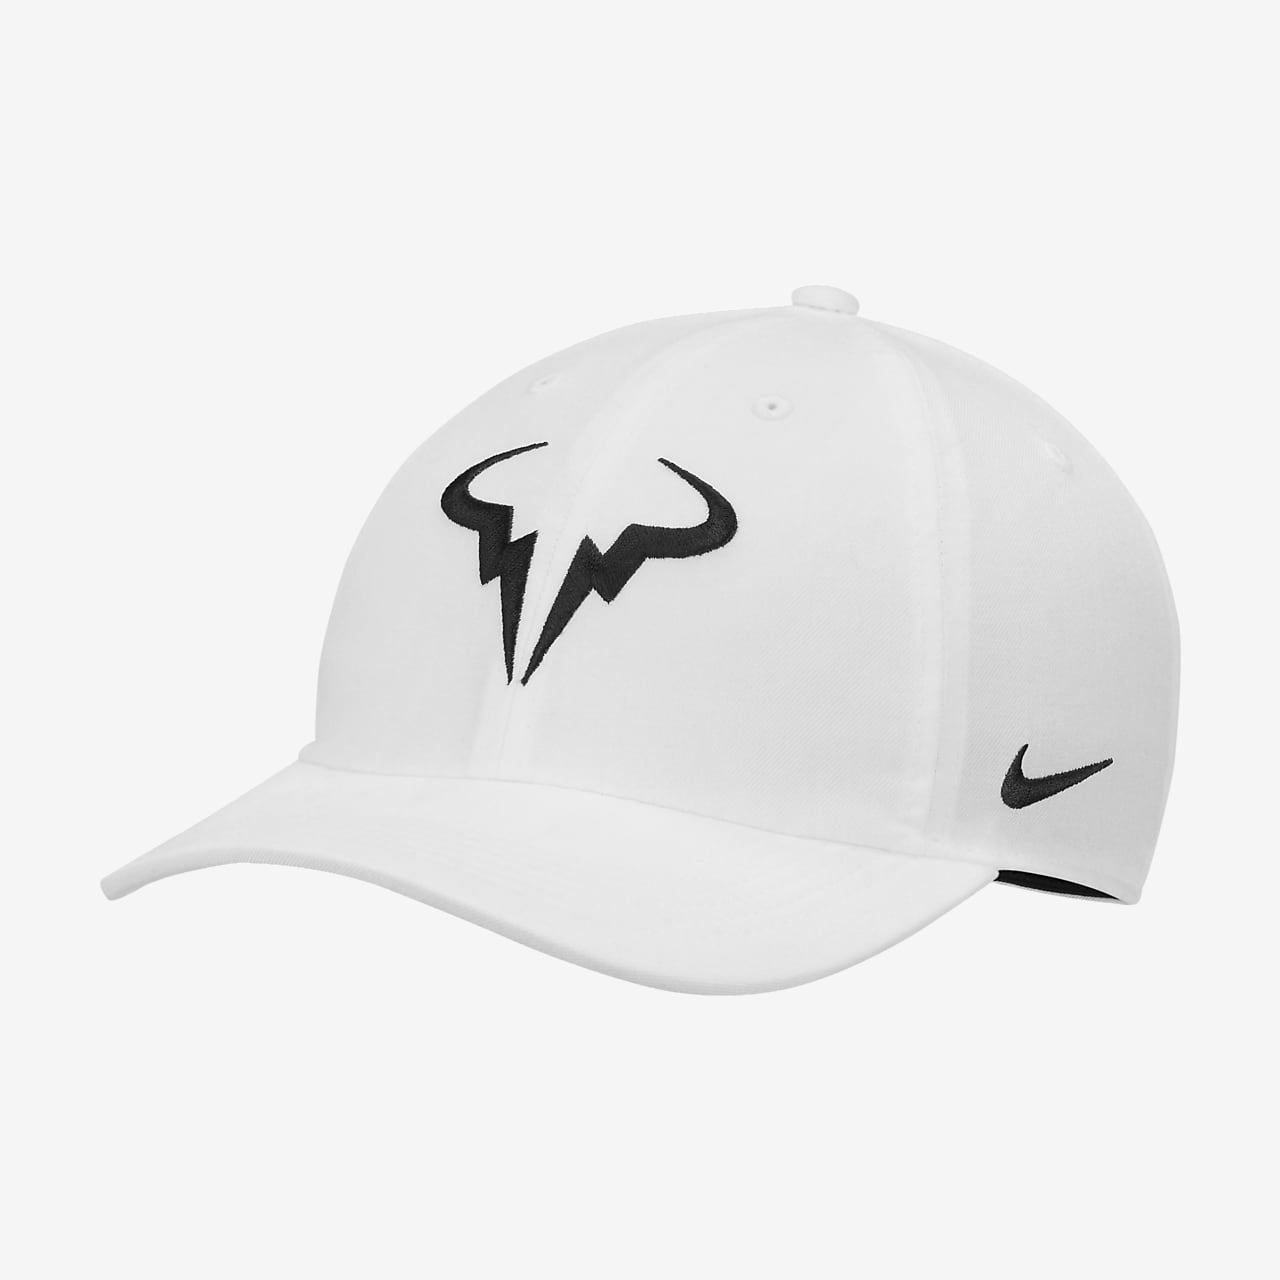 NikeCourt AeroBill Rafa H86 可調式網球帽